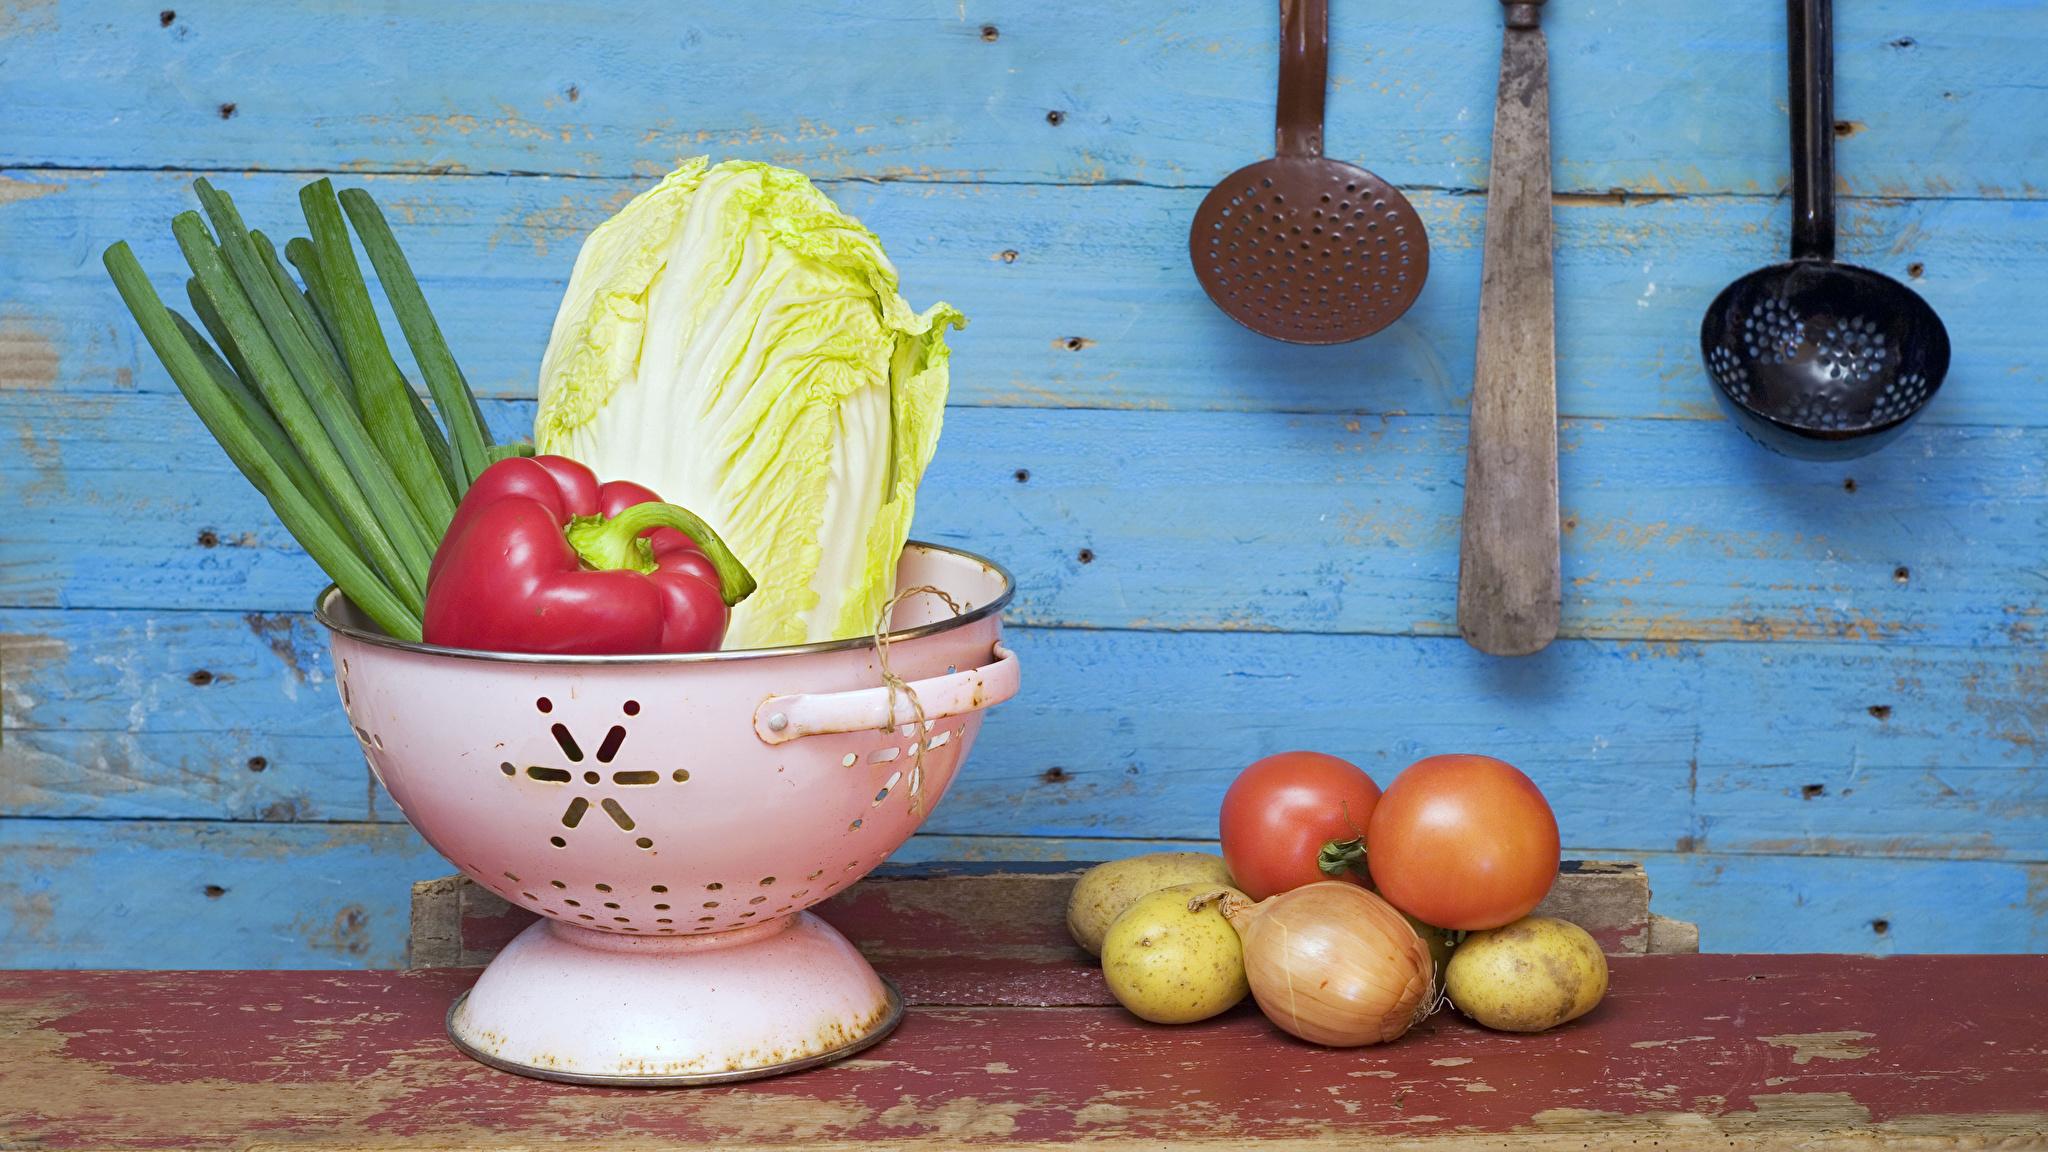 Bilder Tomate Zwiebel Kartoffel Gemüse Lebensmittel Bretter 2048x1152